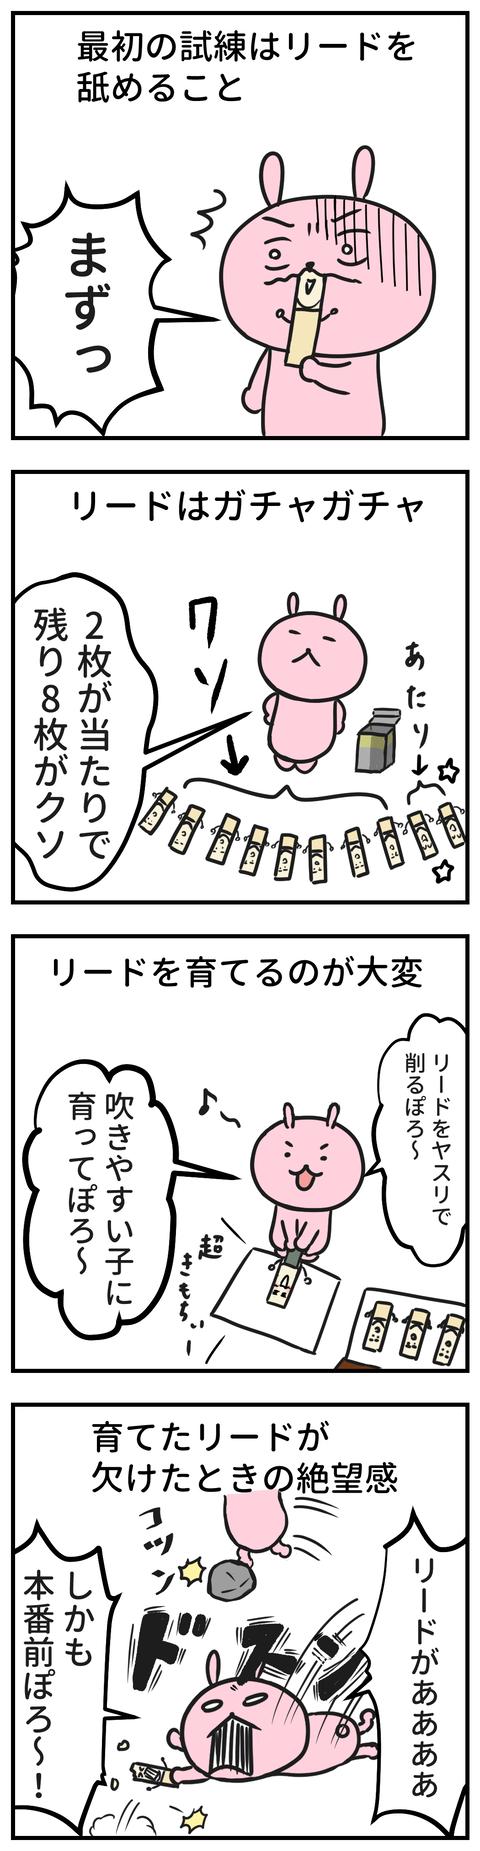 manga-yuzuporo37-1